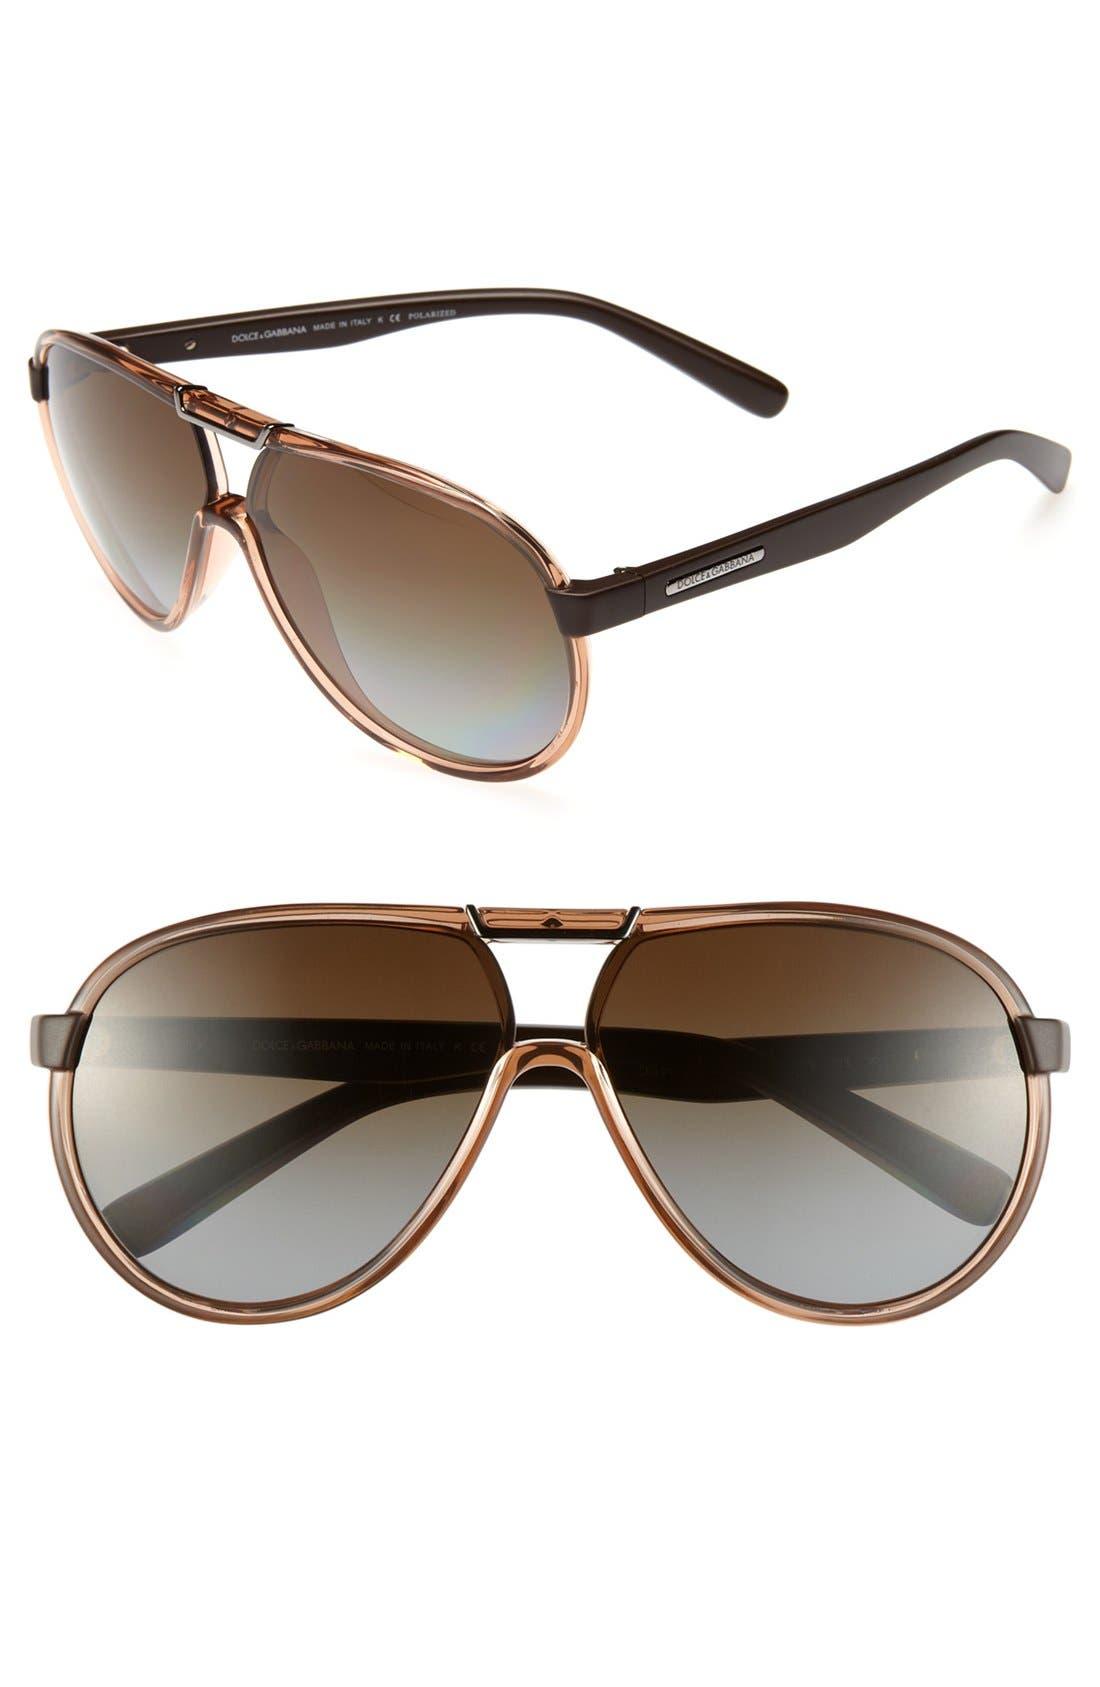 Alternate Image 1 Selected - Dolce&Gabbana 63mm Polarized Brow Bar Sunglasses